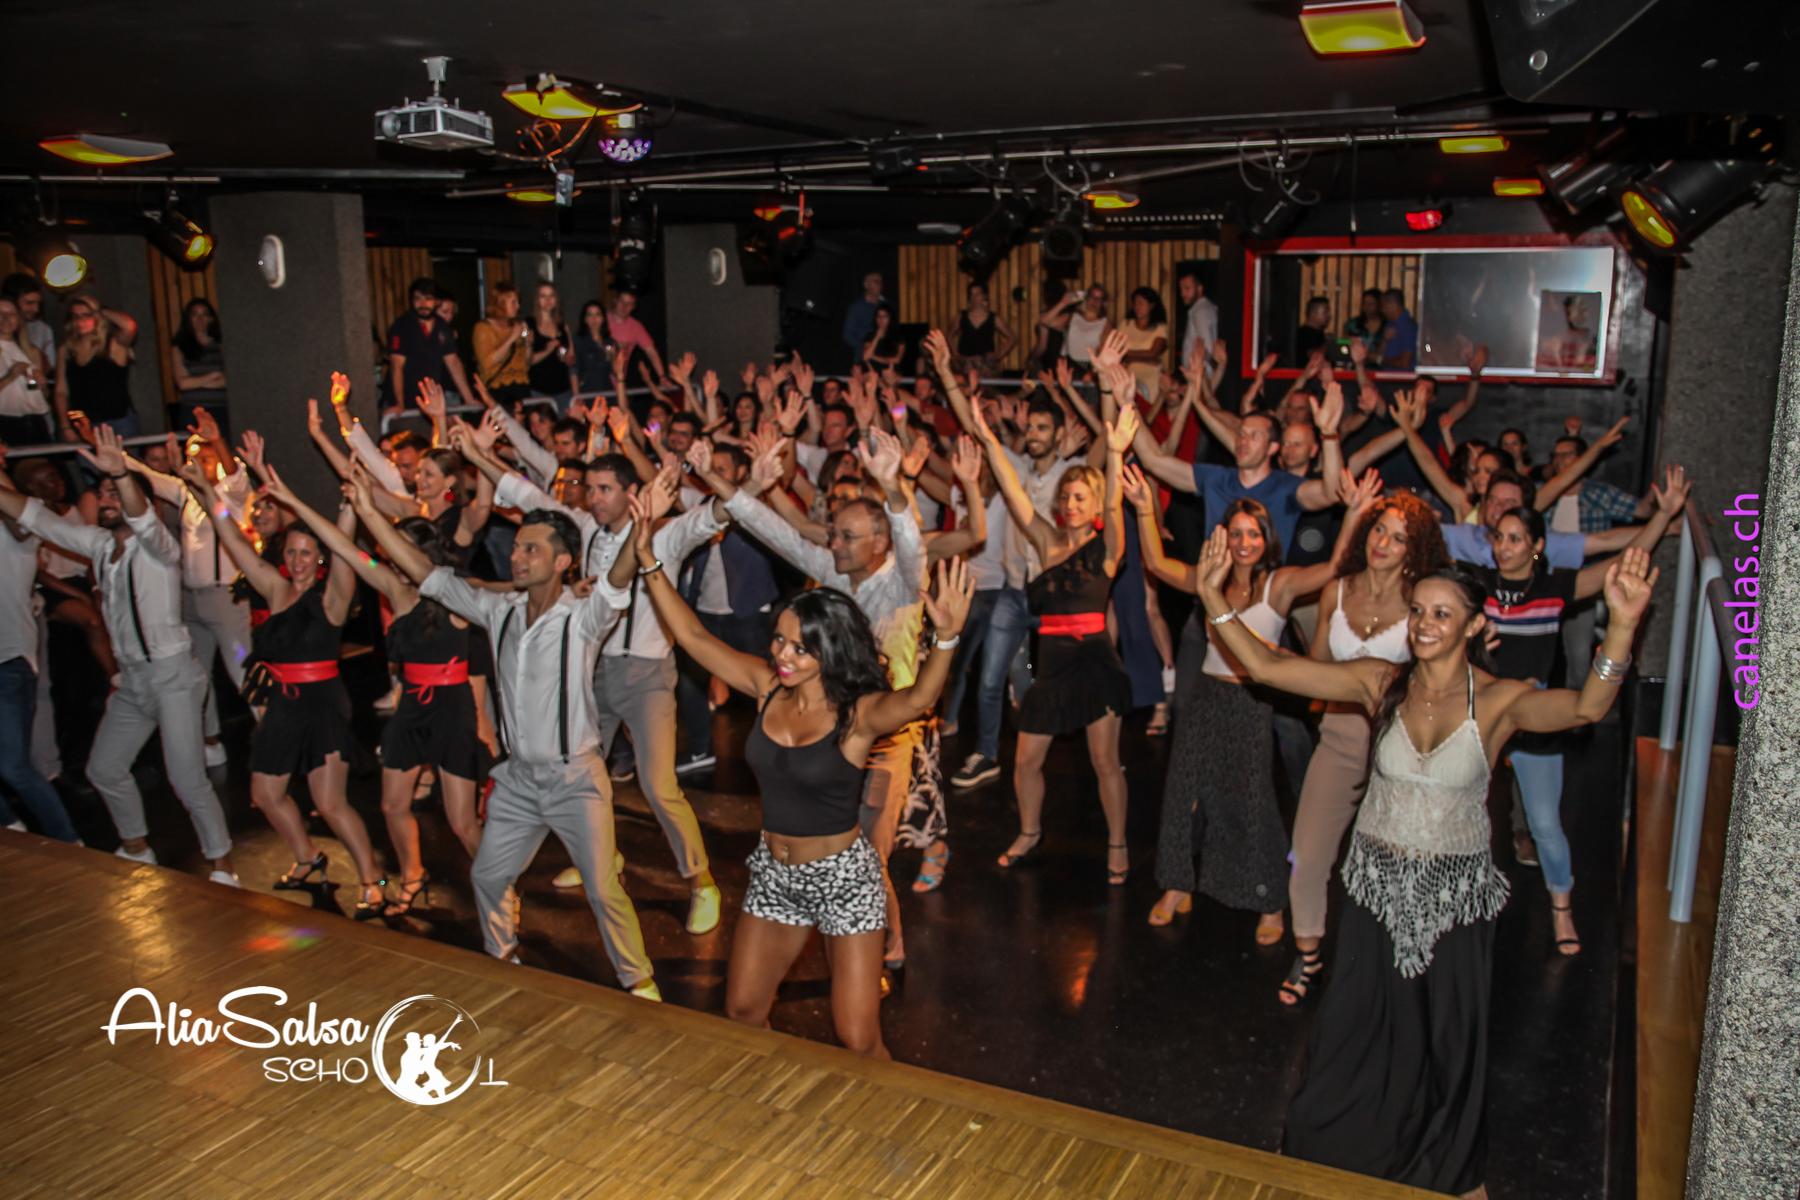 AliaSalsa ecole de danse lausanne soiree bachata salsa cubaineAlia Salsa Soireé Salsa - Bachata-28